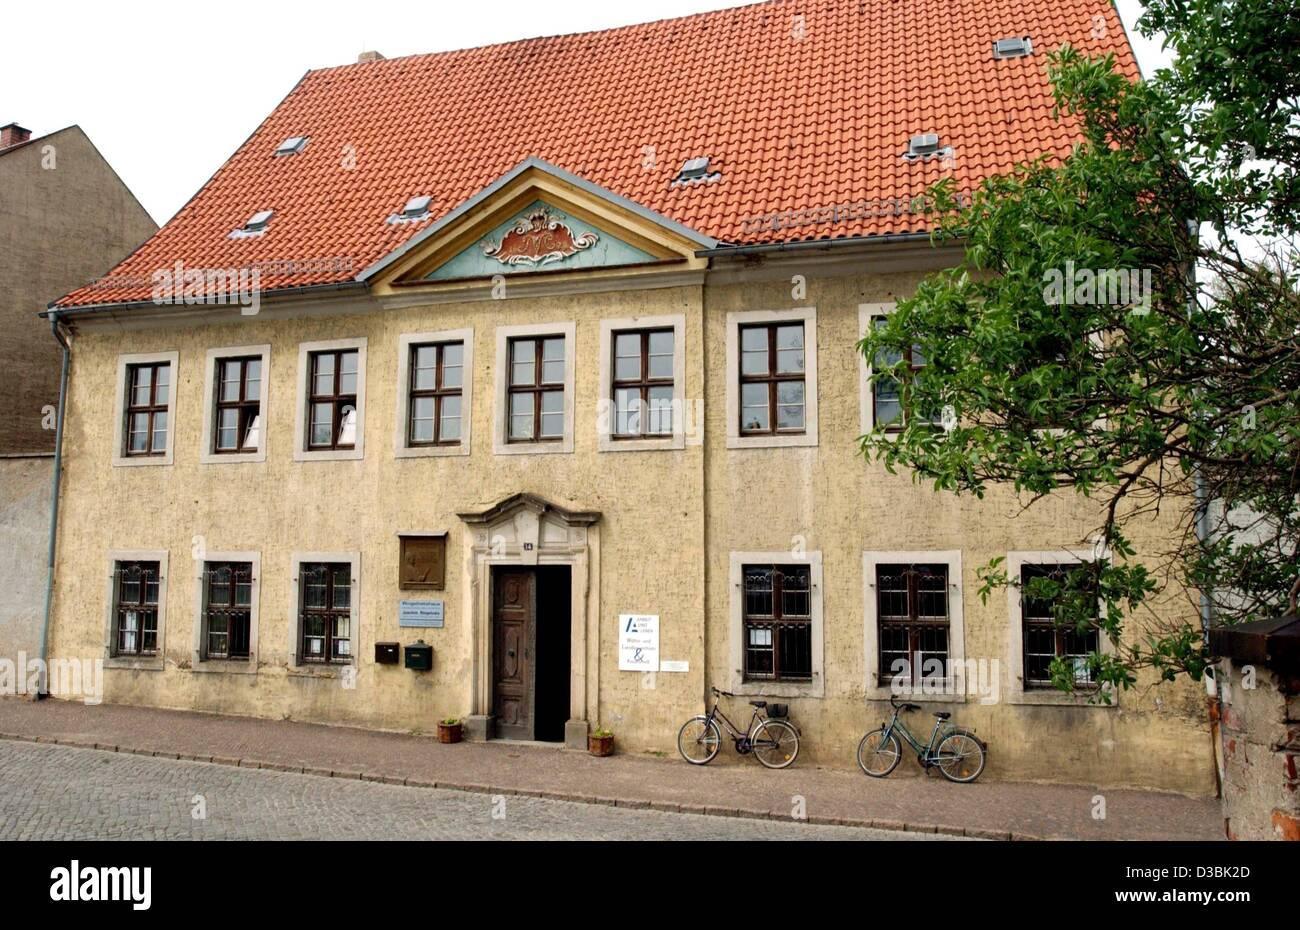 (dpa) - A view of the Ringelnatz house, the birthplace of German writer Joachim Ringelnatz, in Wurzen, Germany, - Stock Image